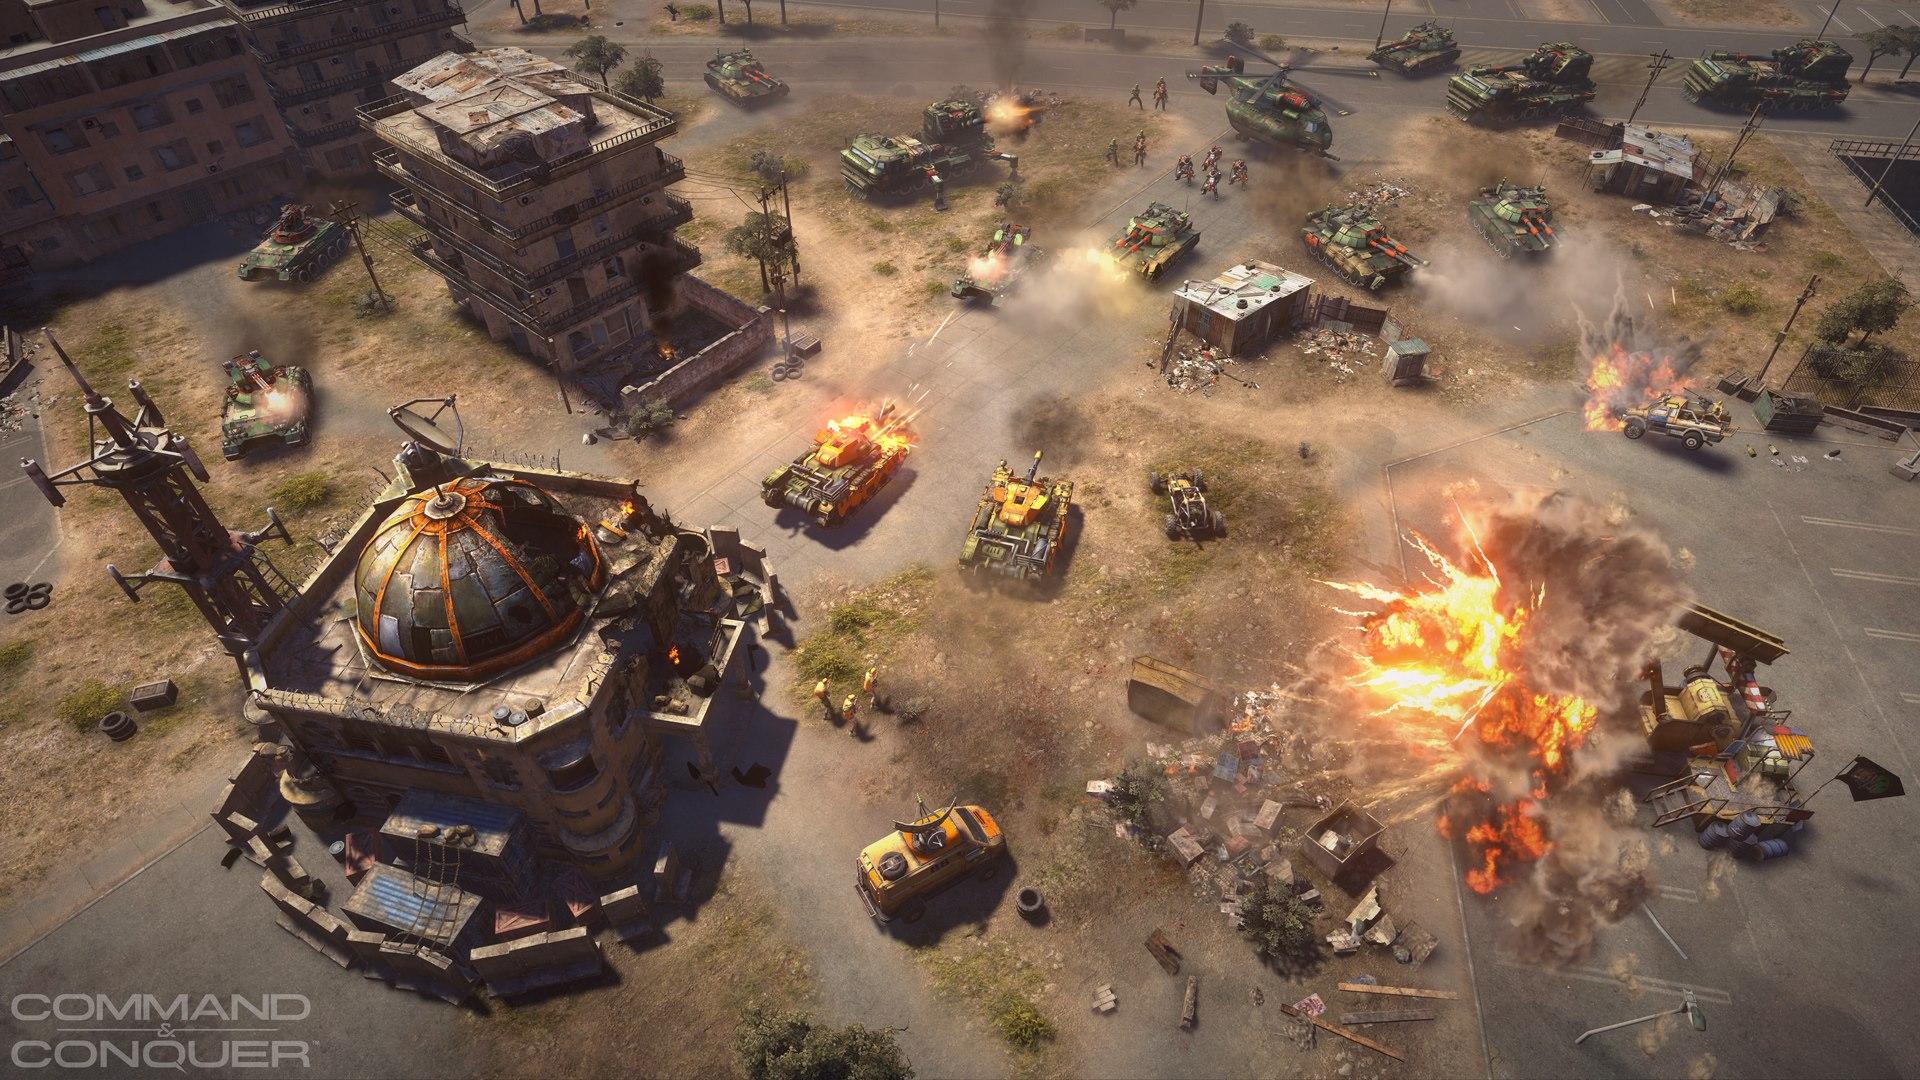 apa attack Neuer Command & Conquer Screenshot bestätigt Helix und Nukleargeschütz